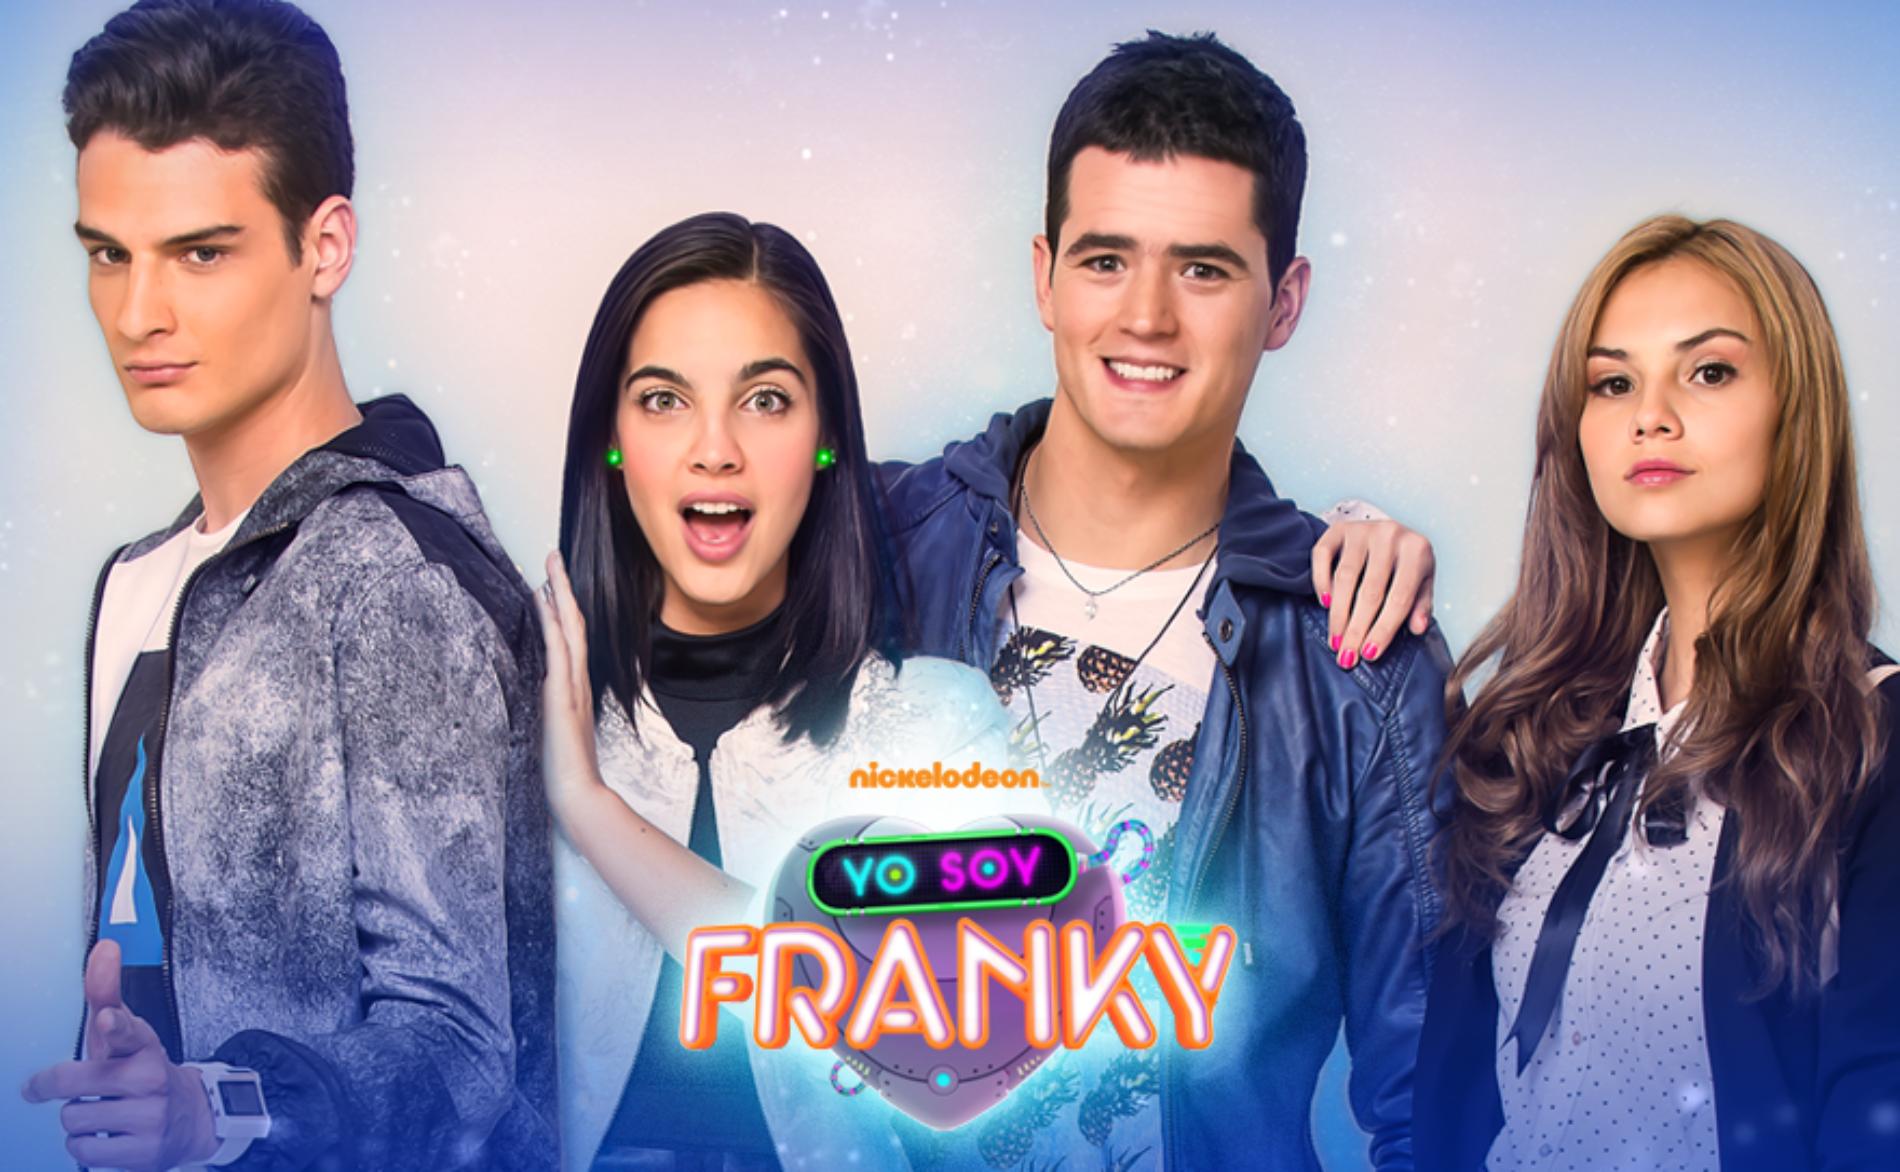 """YO SOY FRANKY"" EN NICKELODEON LATINOAMÉRICA"